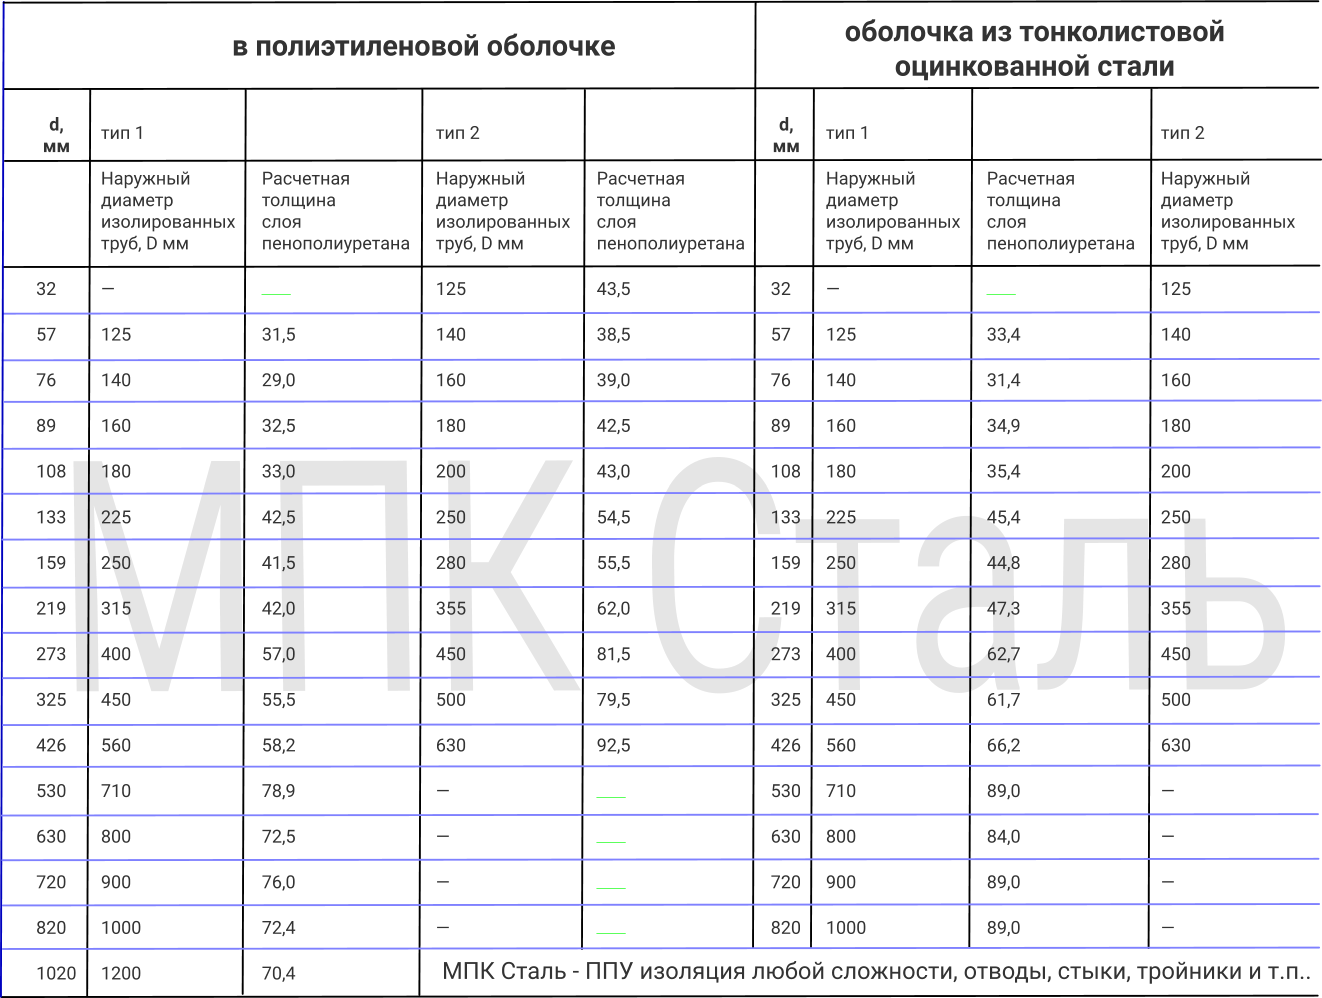 Таблица характеристик изоляции ППУ